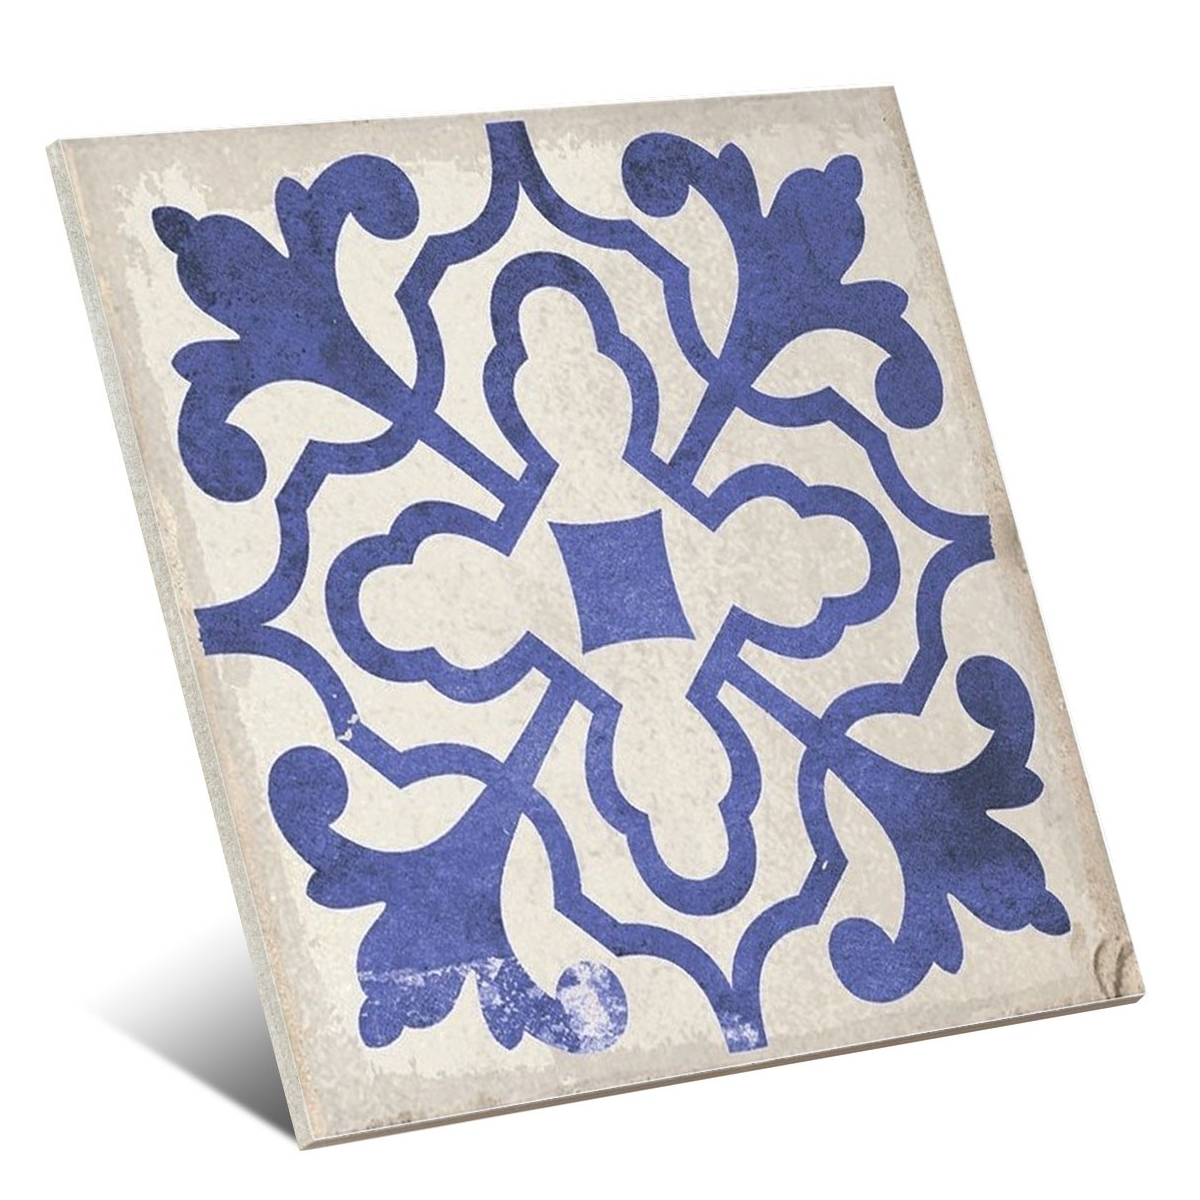 Villena Blue 15x15 (caja 0,5 m2)